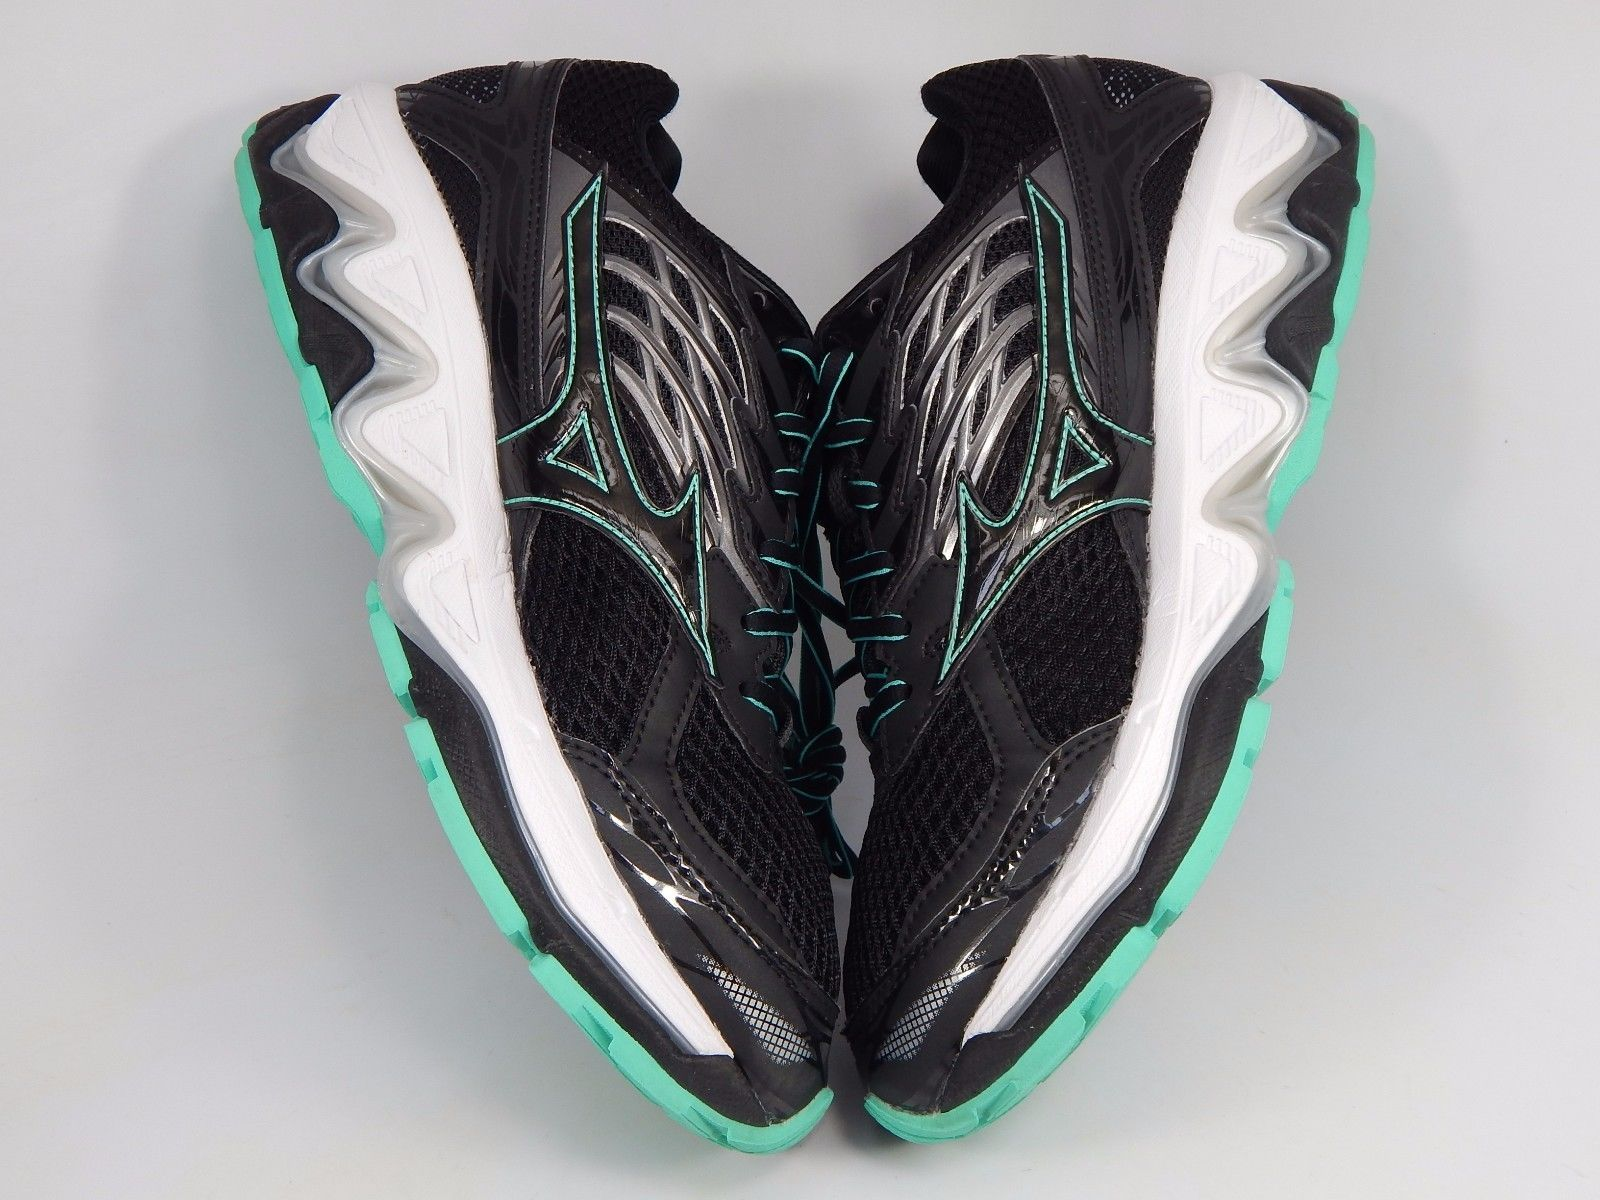 Mizuno Wave Paradox 3 Women's Running Shoes Size US 10 M (B) EU 41 Black Green